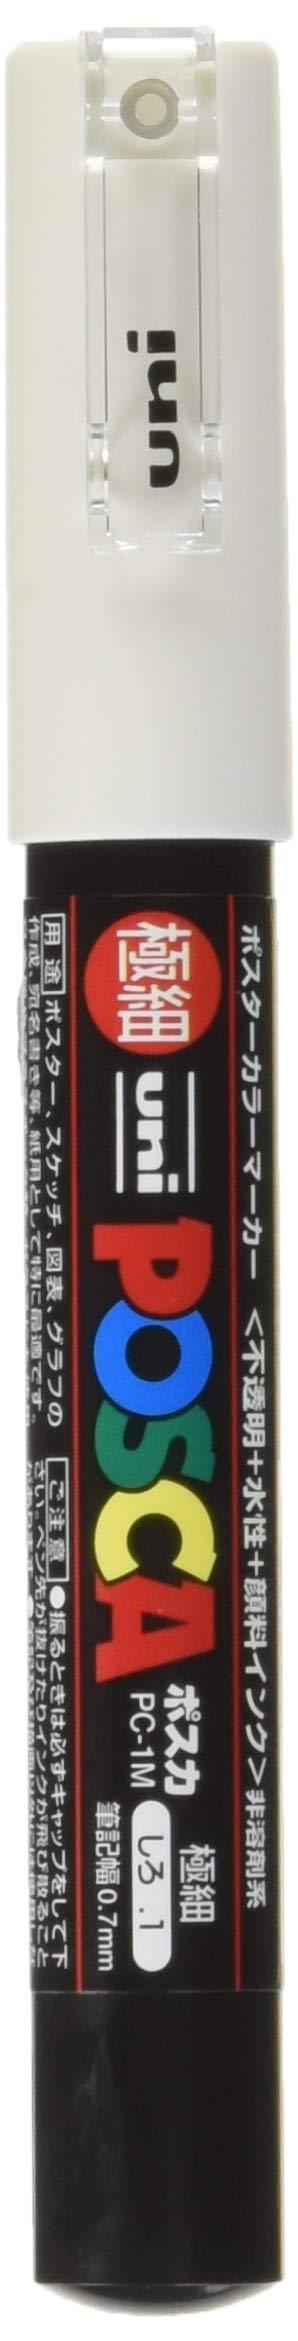 Uni Posca Extra Fine Marker, White (PC1M.1) by uni (Image #1)